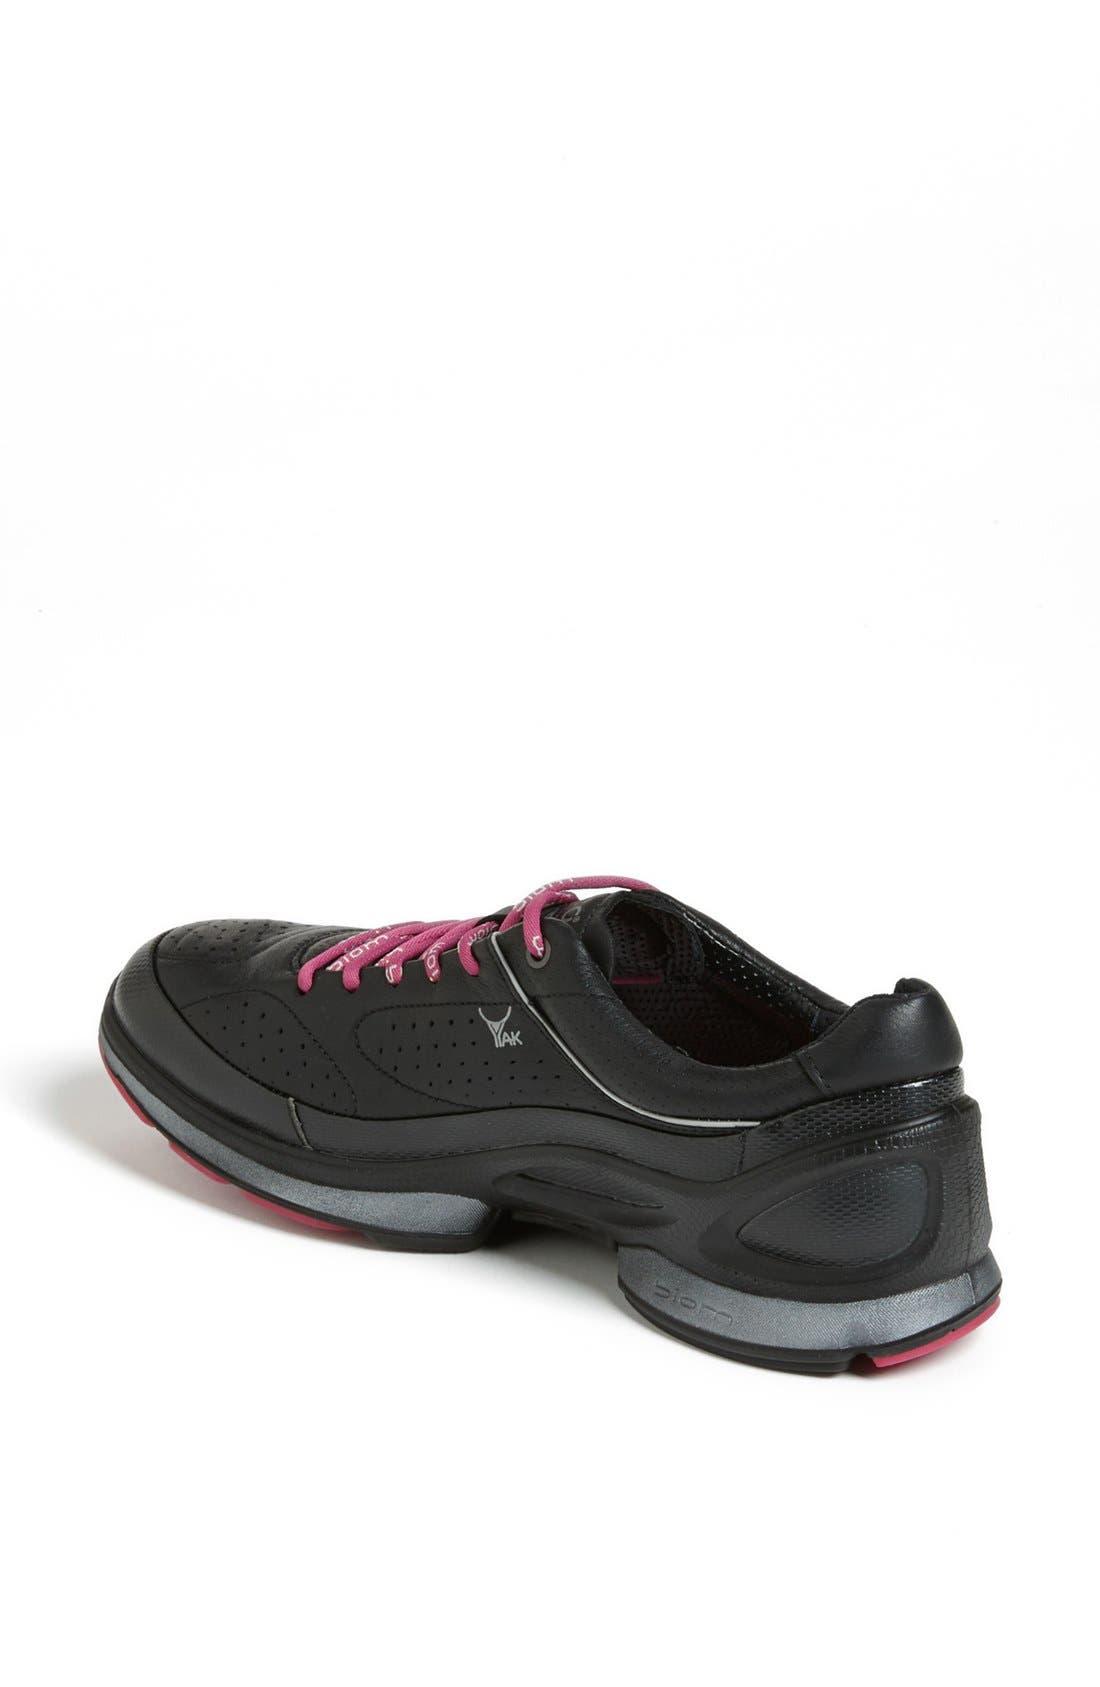 Alternate Image 3  - ECCO 'Biom Evo Trainer Plus' Training Shoe (Women)